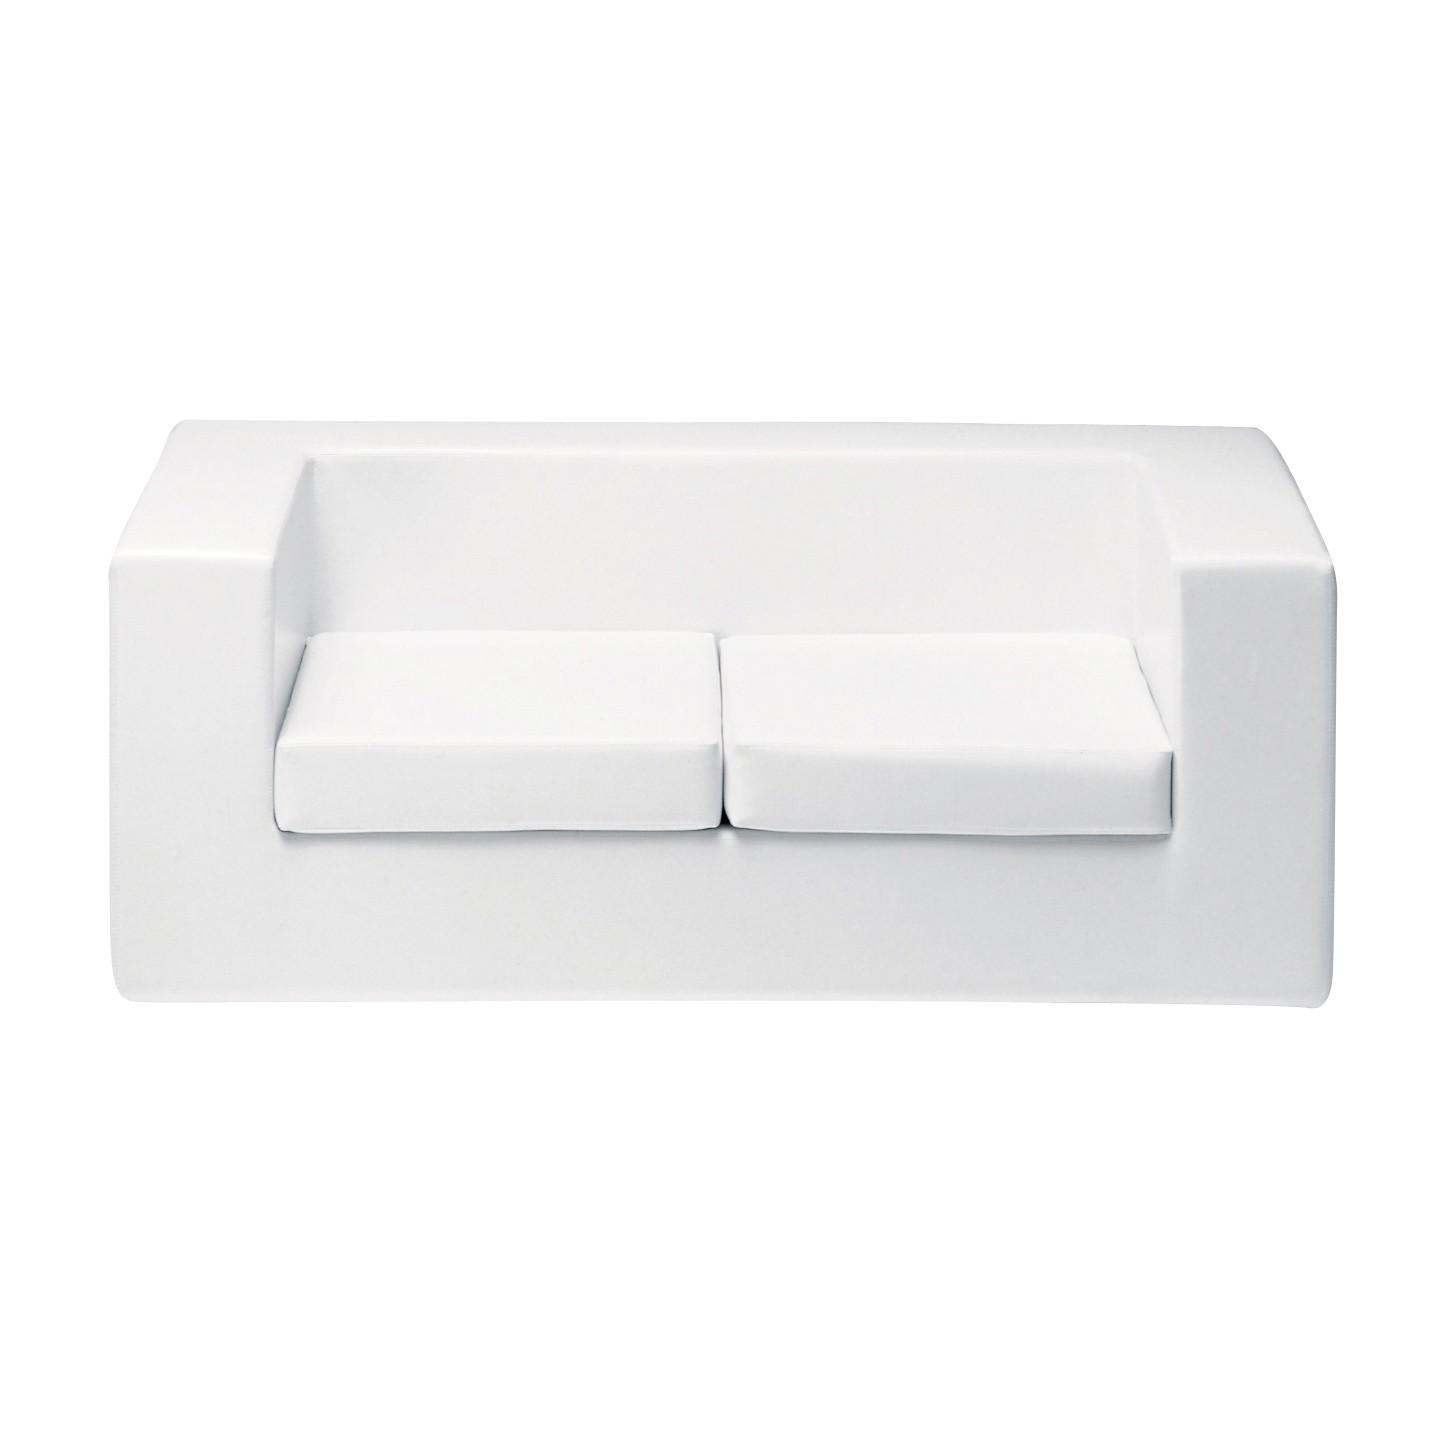 Full Size of Sofa Abnehmbarer Bezug Big Hussen Modulares Mit Abnehmbarem Abnehmbaren Ikea Zanotta Throw Away 1150 2 Sitzer Ambientedirect Federkern Großes Lederpflege Sofa Sofa Abnehmbarer Bezug